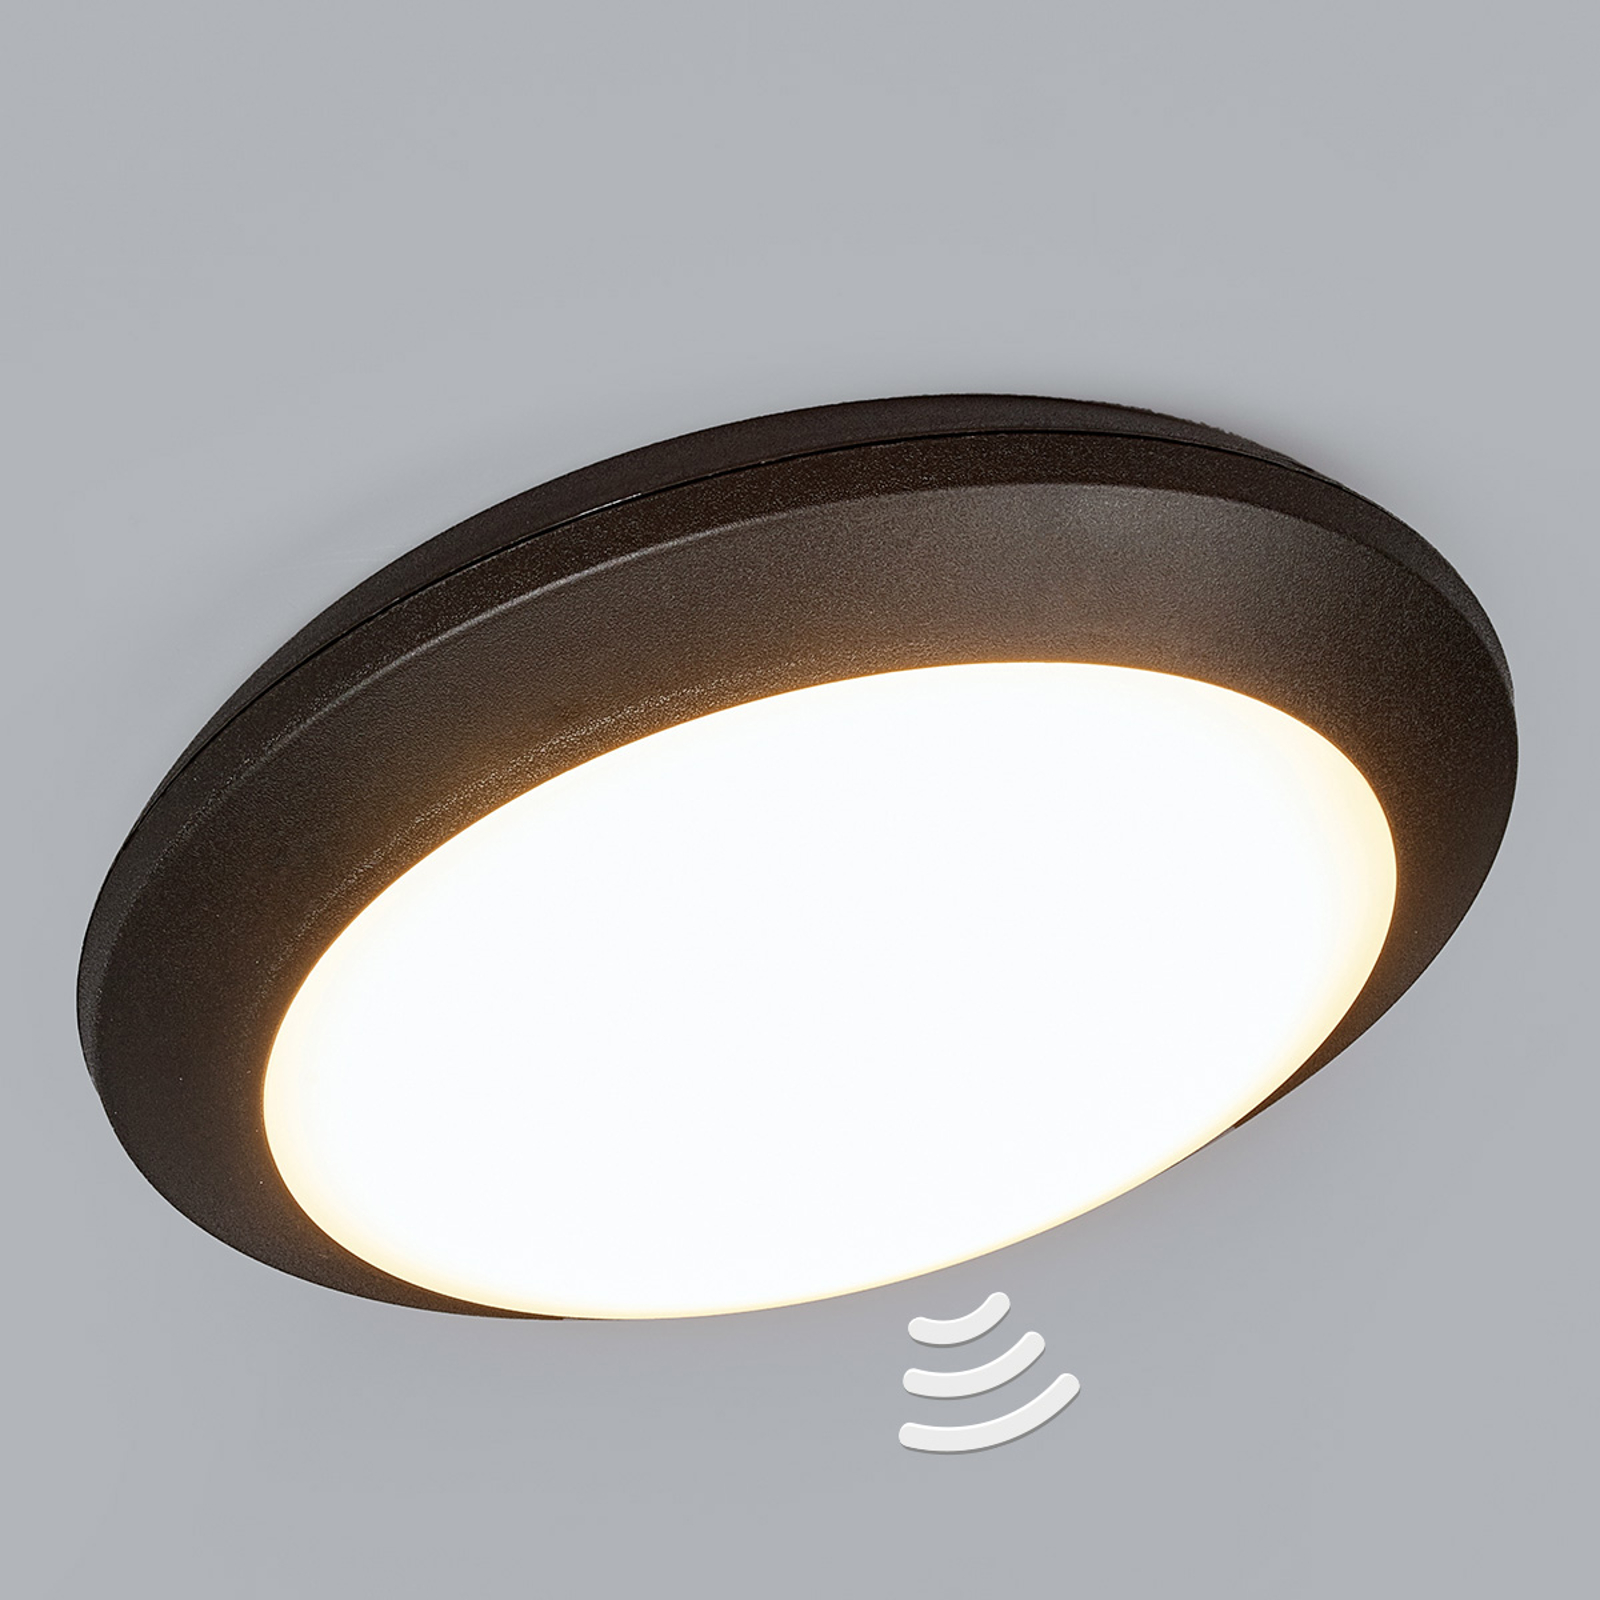 Sensor taklampe Umberta svart 11 W 3000 K